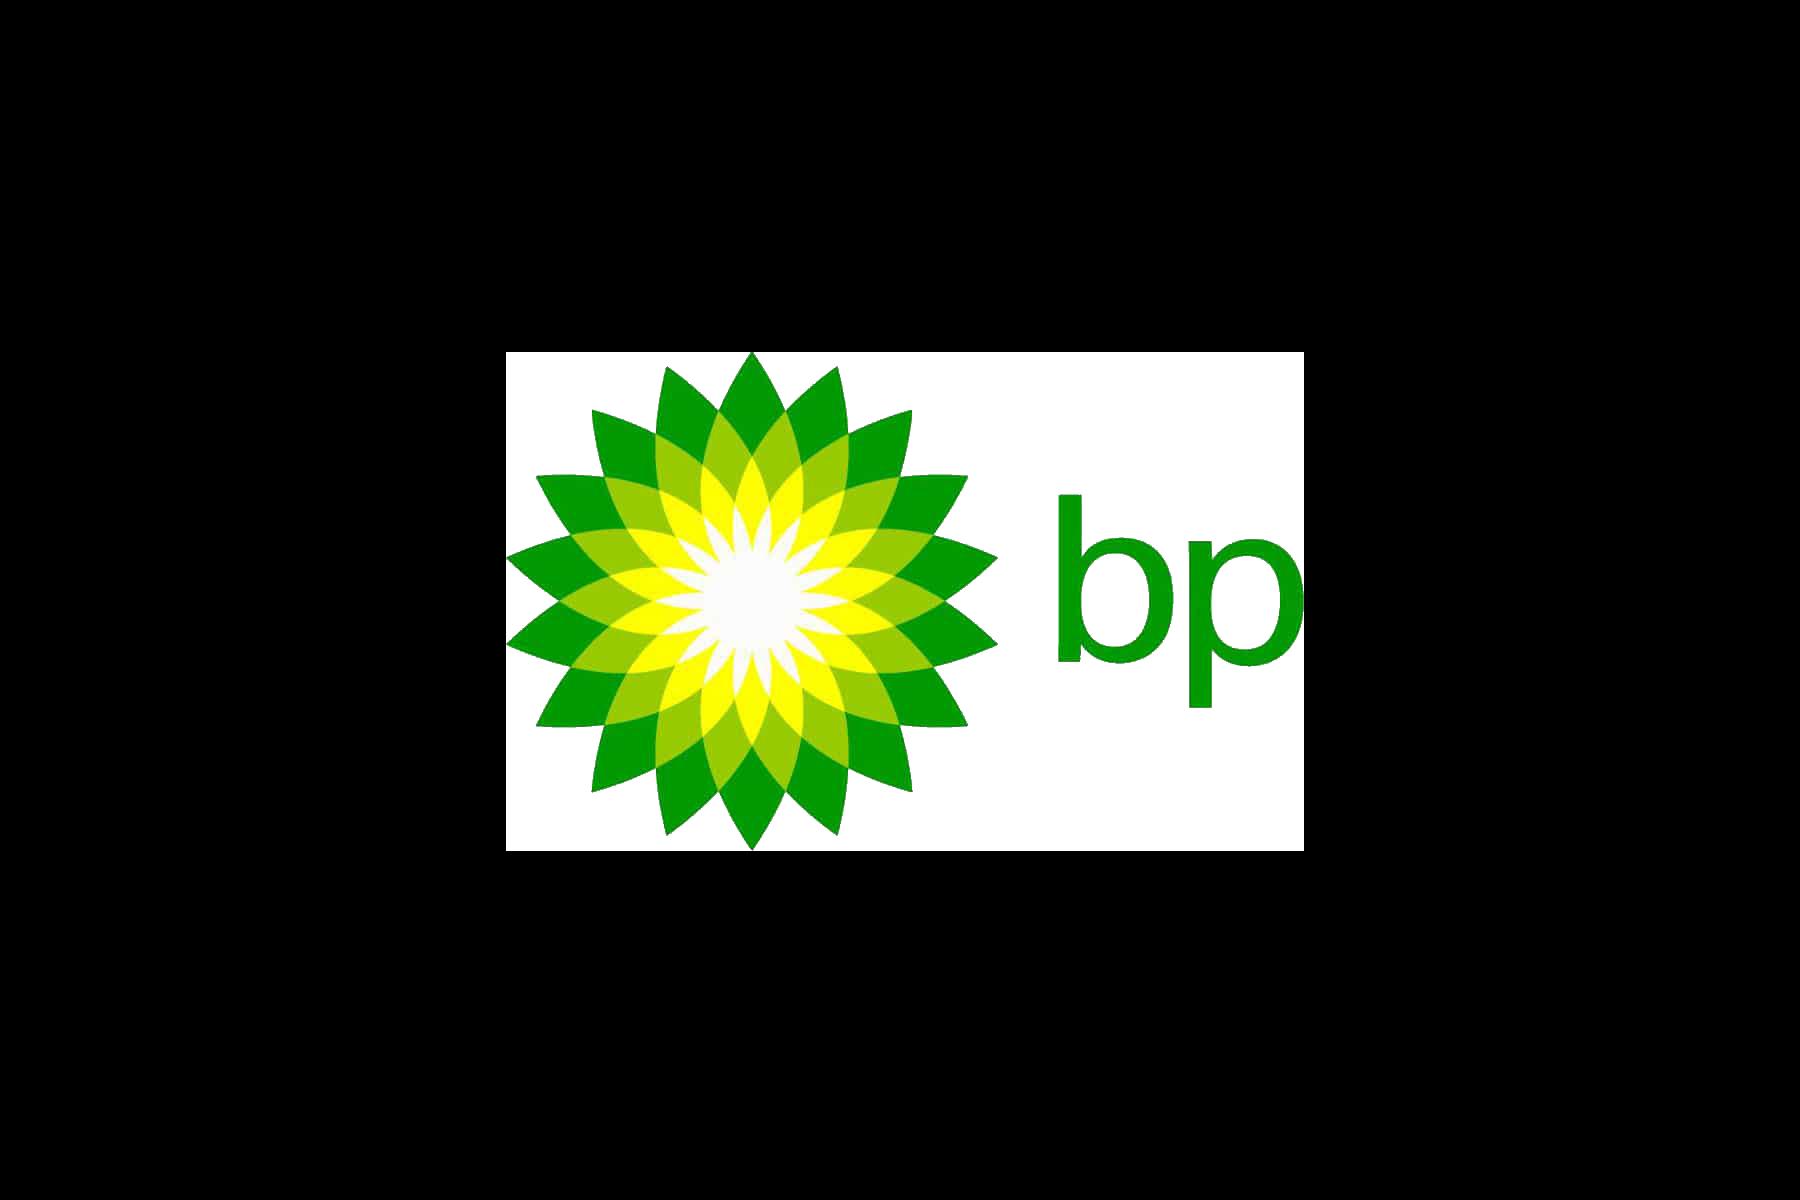 bp-logo-white-background-f5-e1499913620824.png